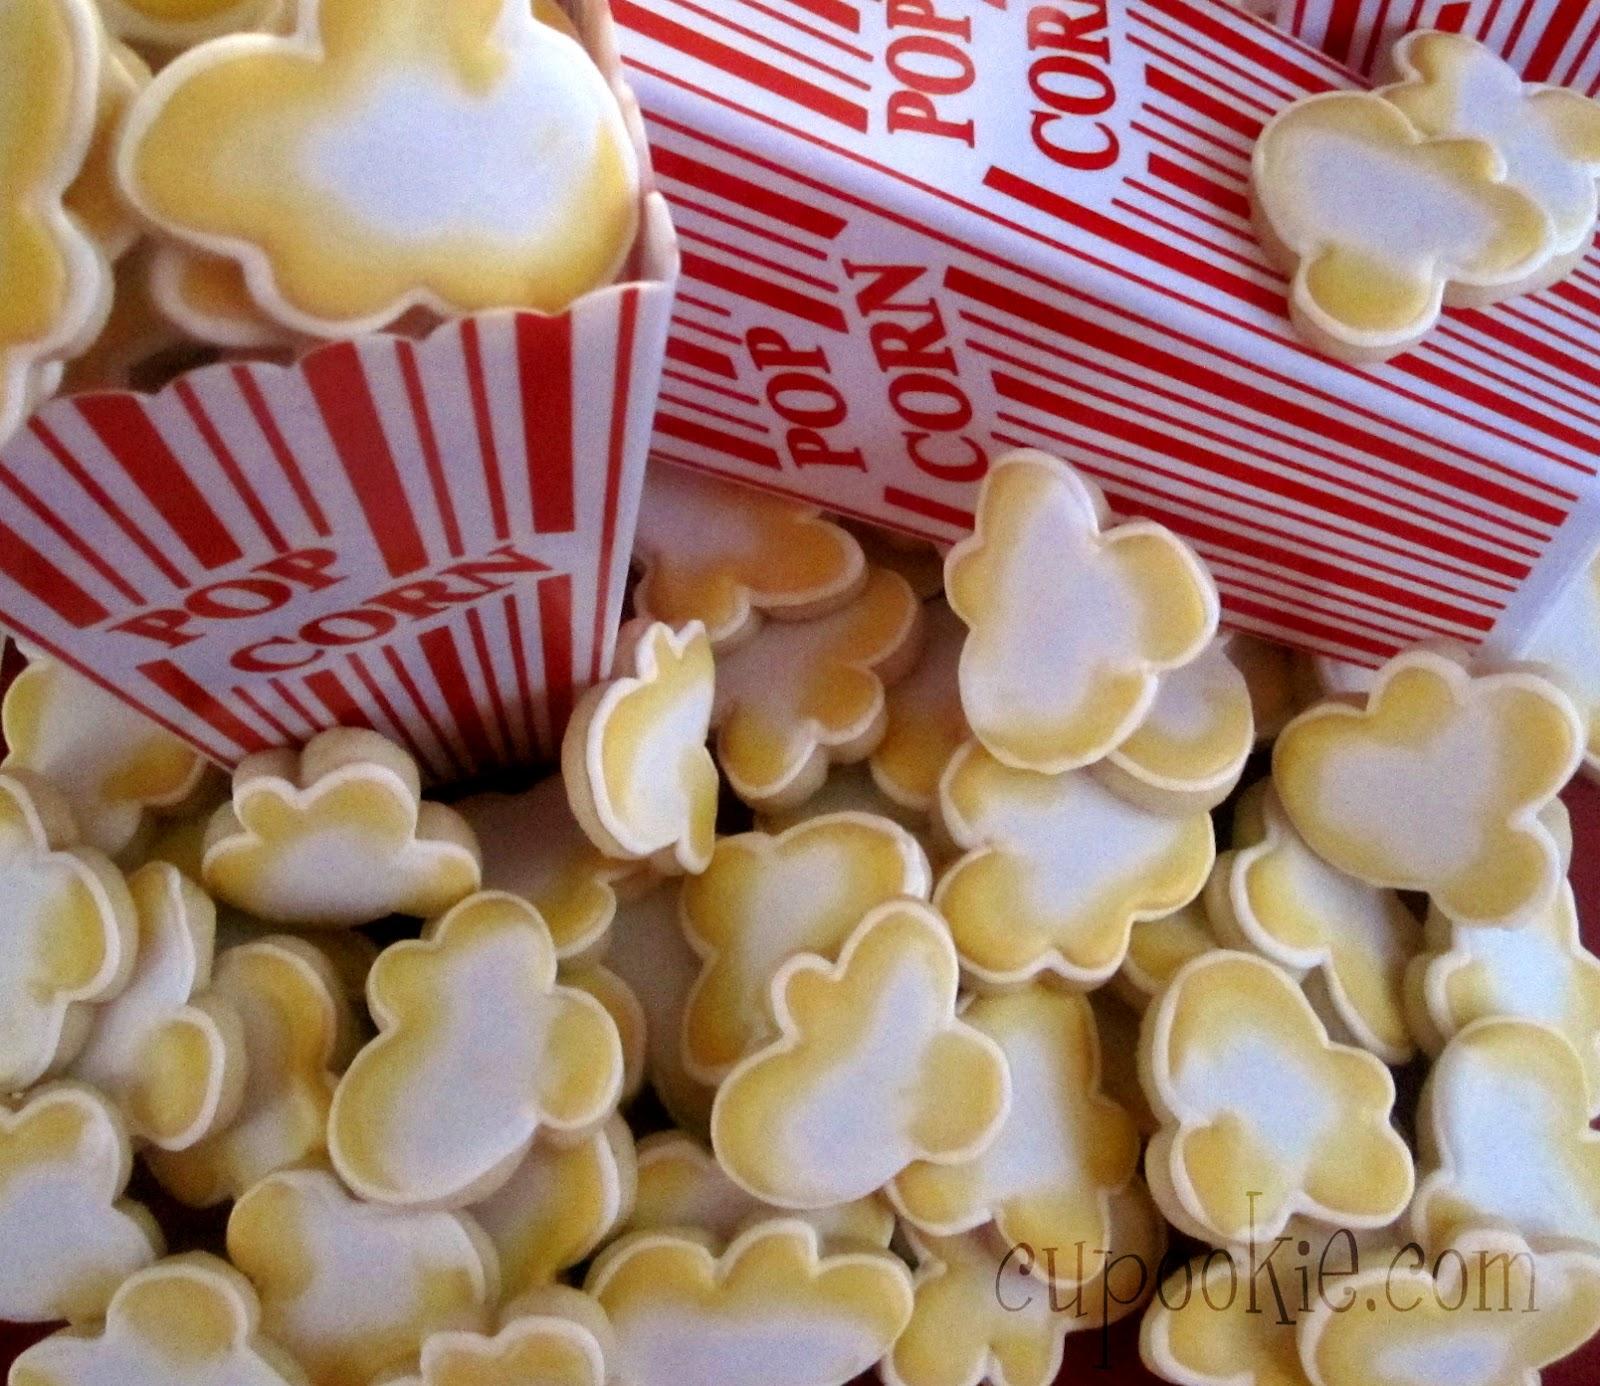 Cupookie: Popcorn Cookies